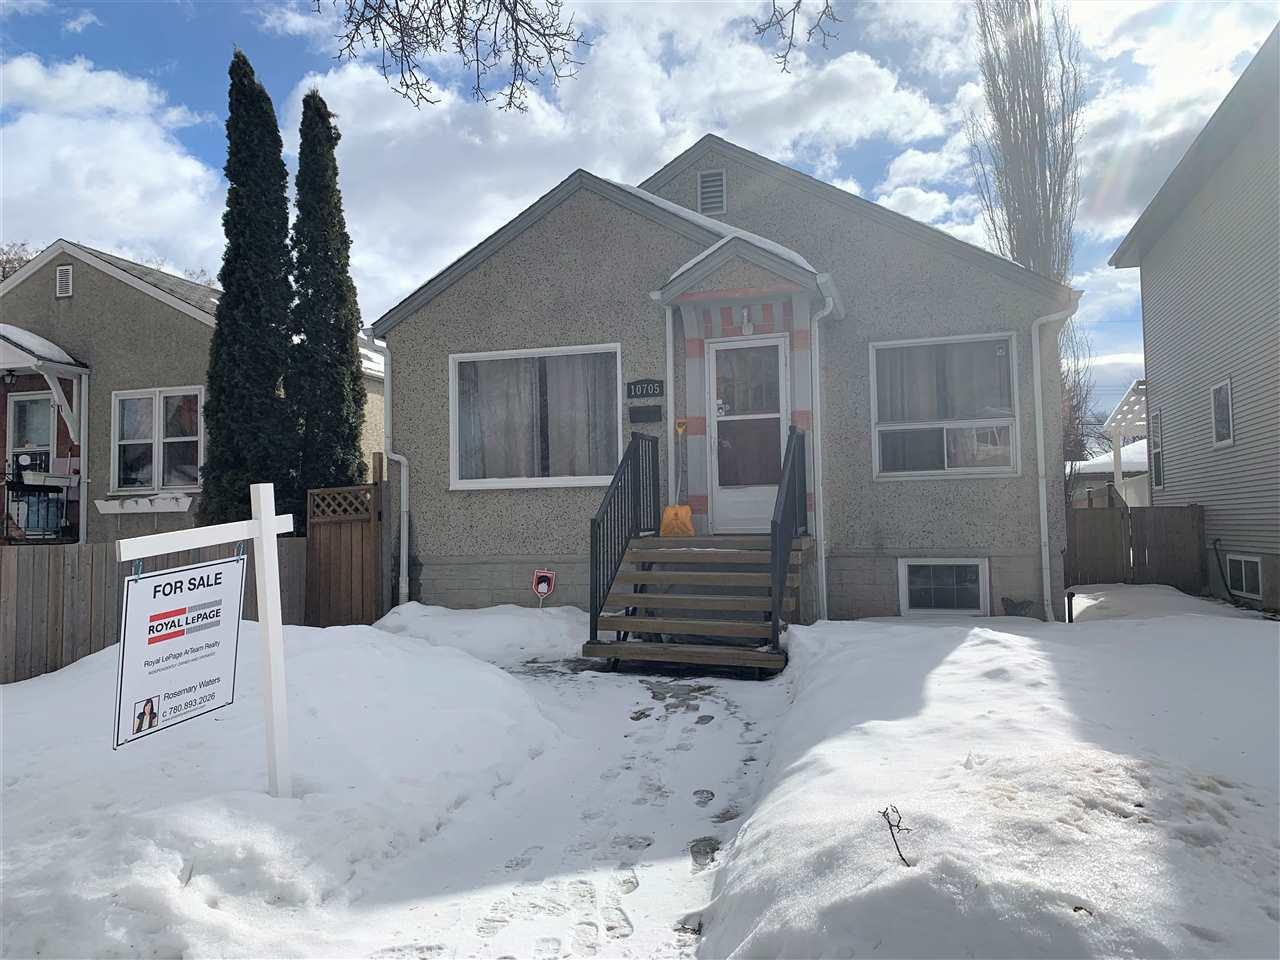 Main Photo: 10705 71 Avenue in Edmonton: Zone 15 House for sale : MLS®# E4189956